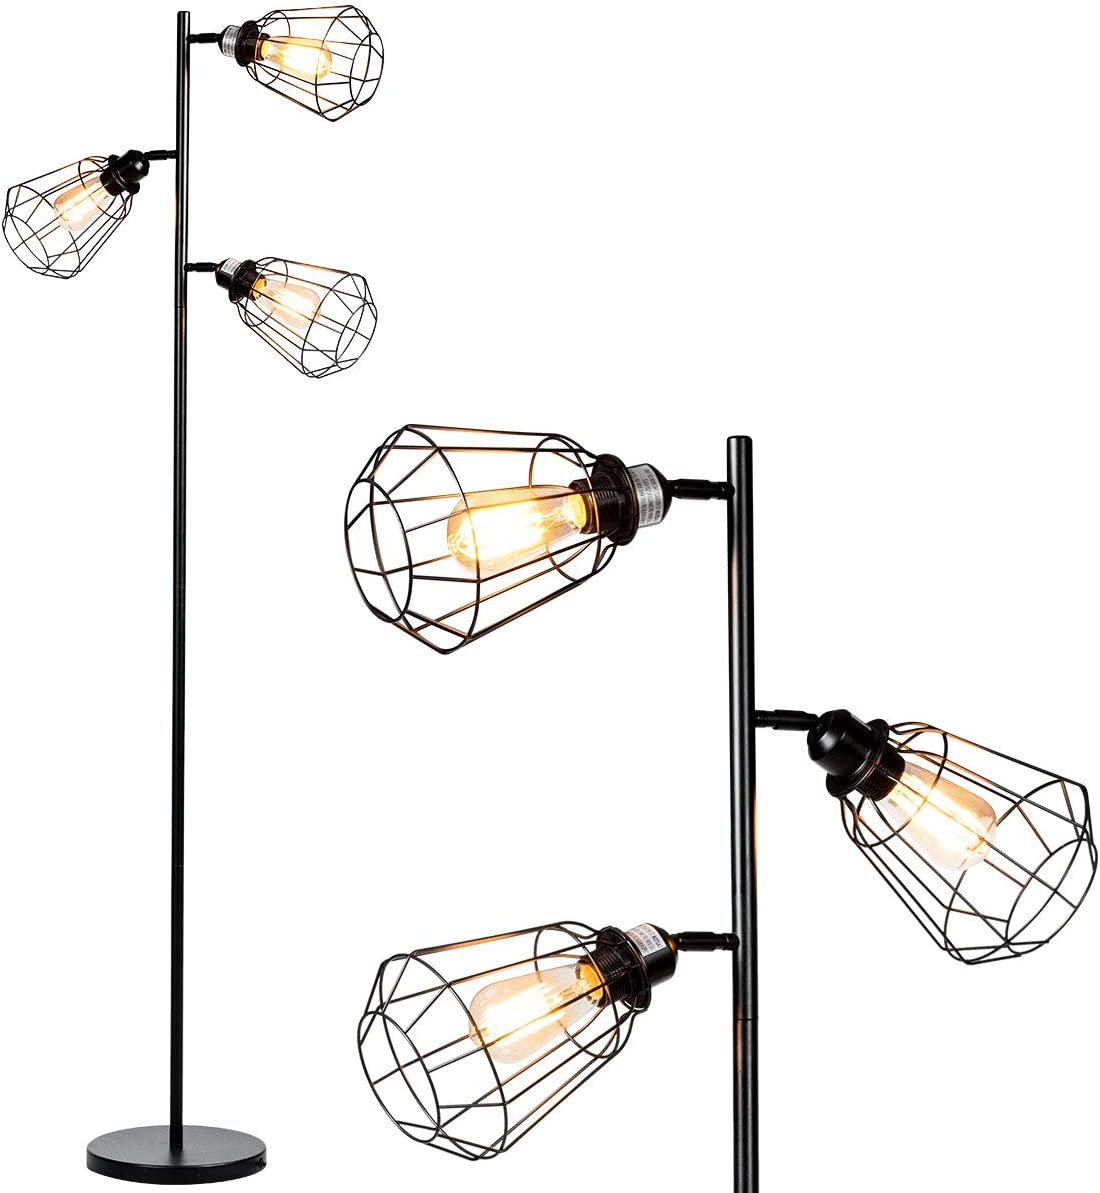 Tangkula 65 Floor Lamp, 3-Light Tall Tree Lamp, Industrial Rustic Floor Lamp with 3 Light Bulbs Adjustable Lampshade, Modern Metal Standing Lamp for Reading Bedroom Living Room Office D cor, Black